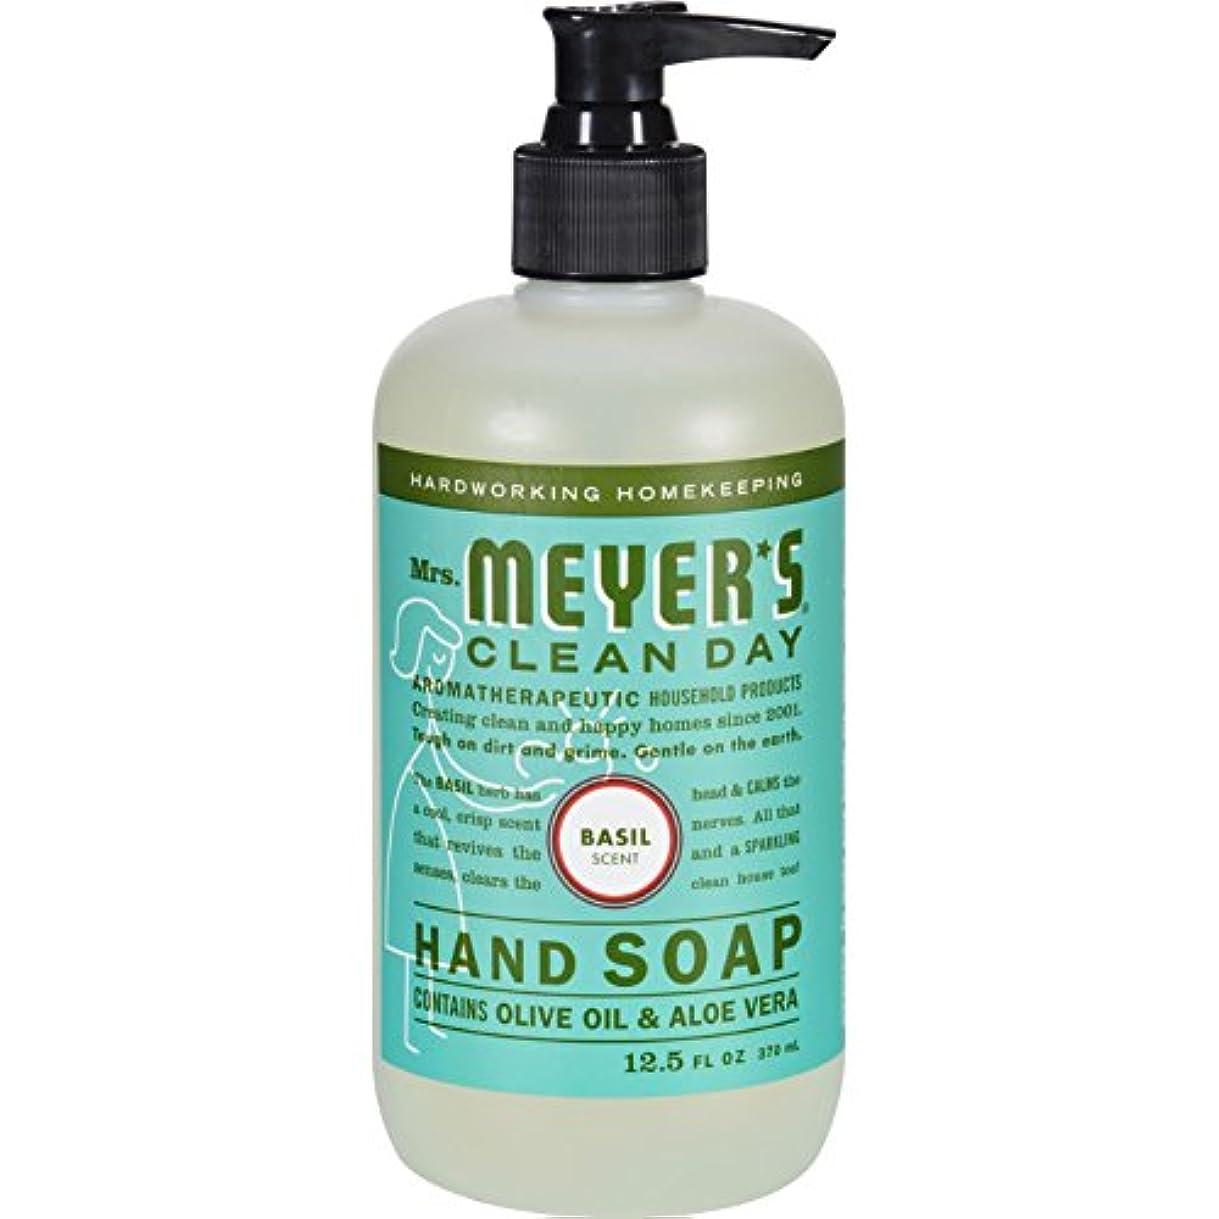 迷信魔術師政権MRS. MEYER'S HAND SOAP,LIQ,BASIL, 12.5 FZ by Mrs. Meyer's Clean Day